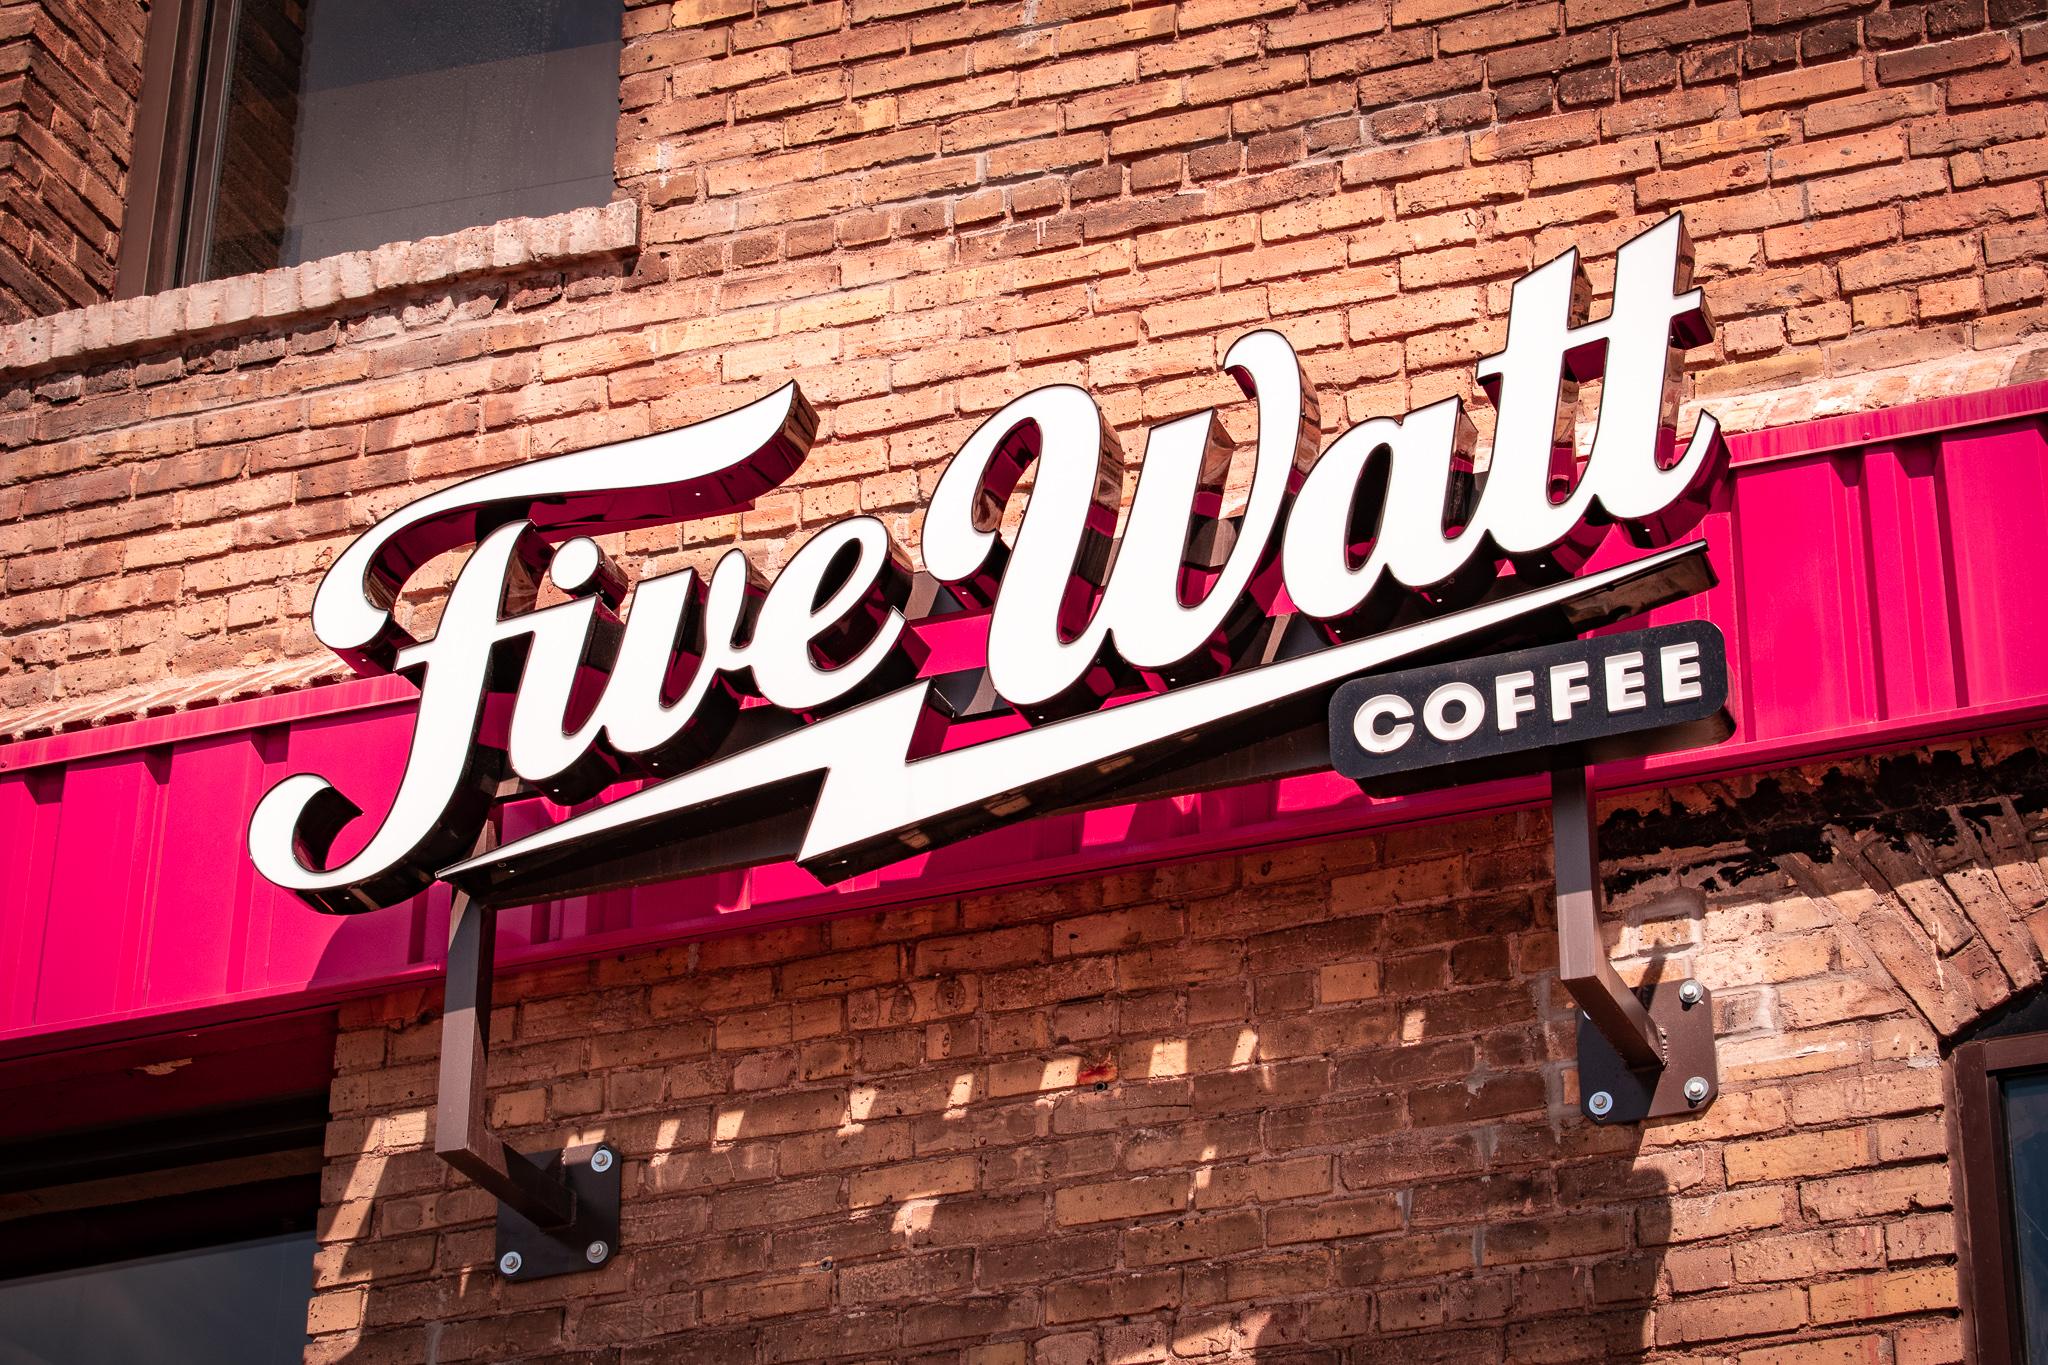 uprooted-traveler-five-watt-sign-coffee-minneapolis-st-paul.jpg